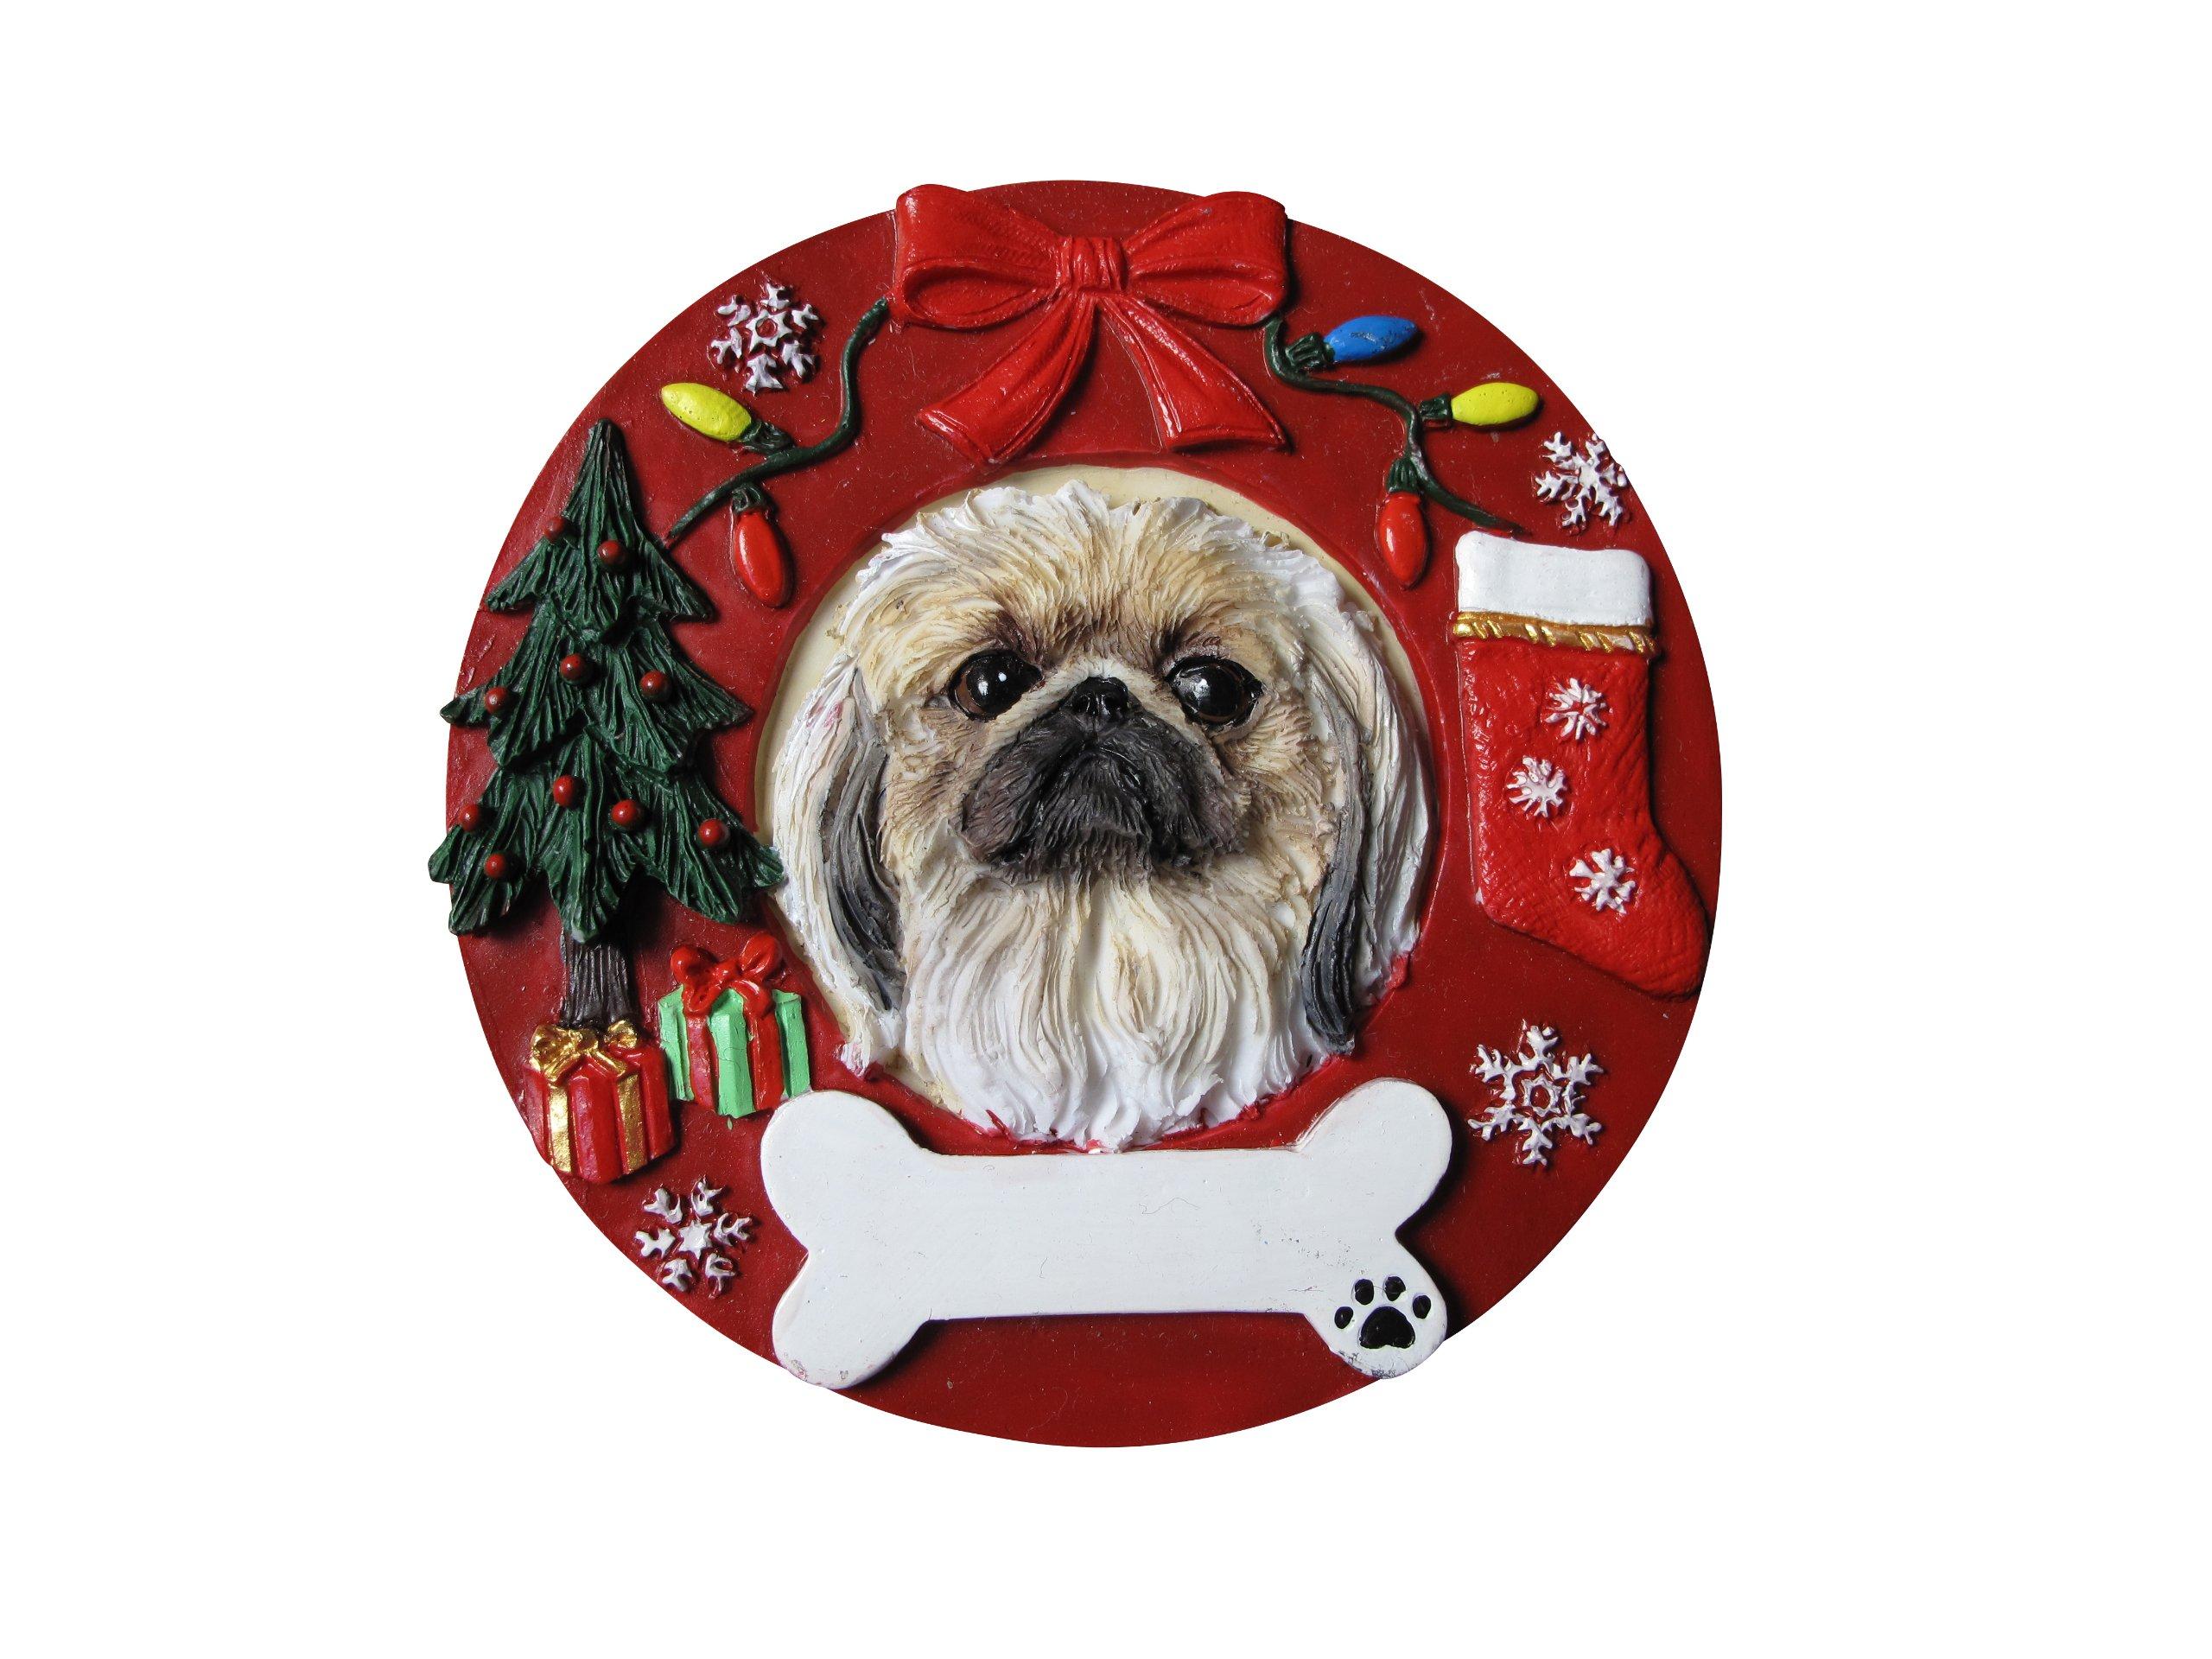 Pekingese-Christmas-Ornament-Wreath-Shaped-Easily-Personalized-Holiday-Decoration-Unique-Pekingese-Lover-Gifts